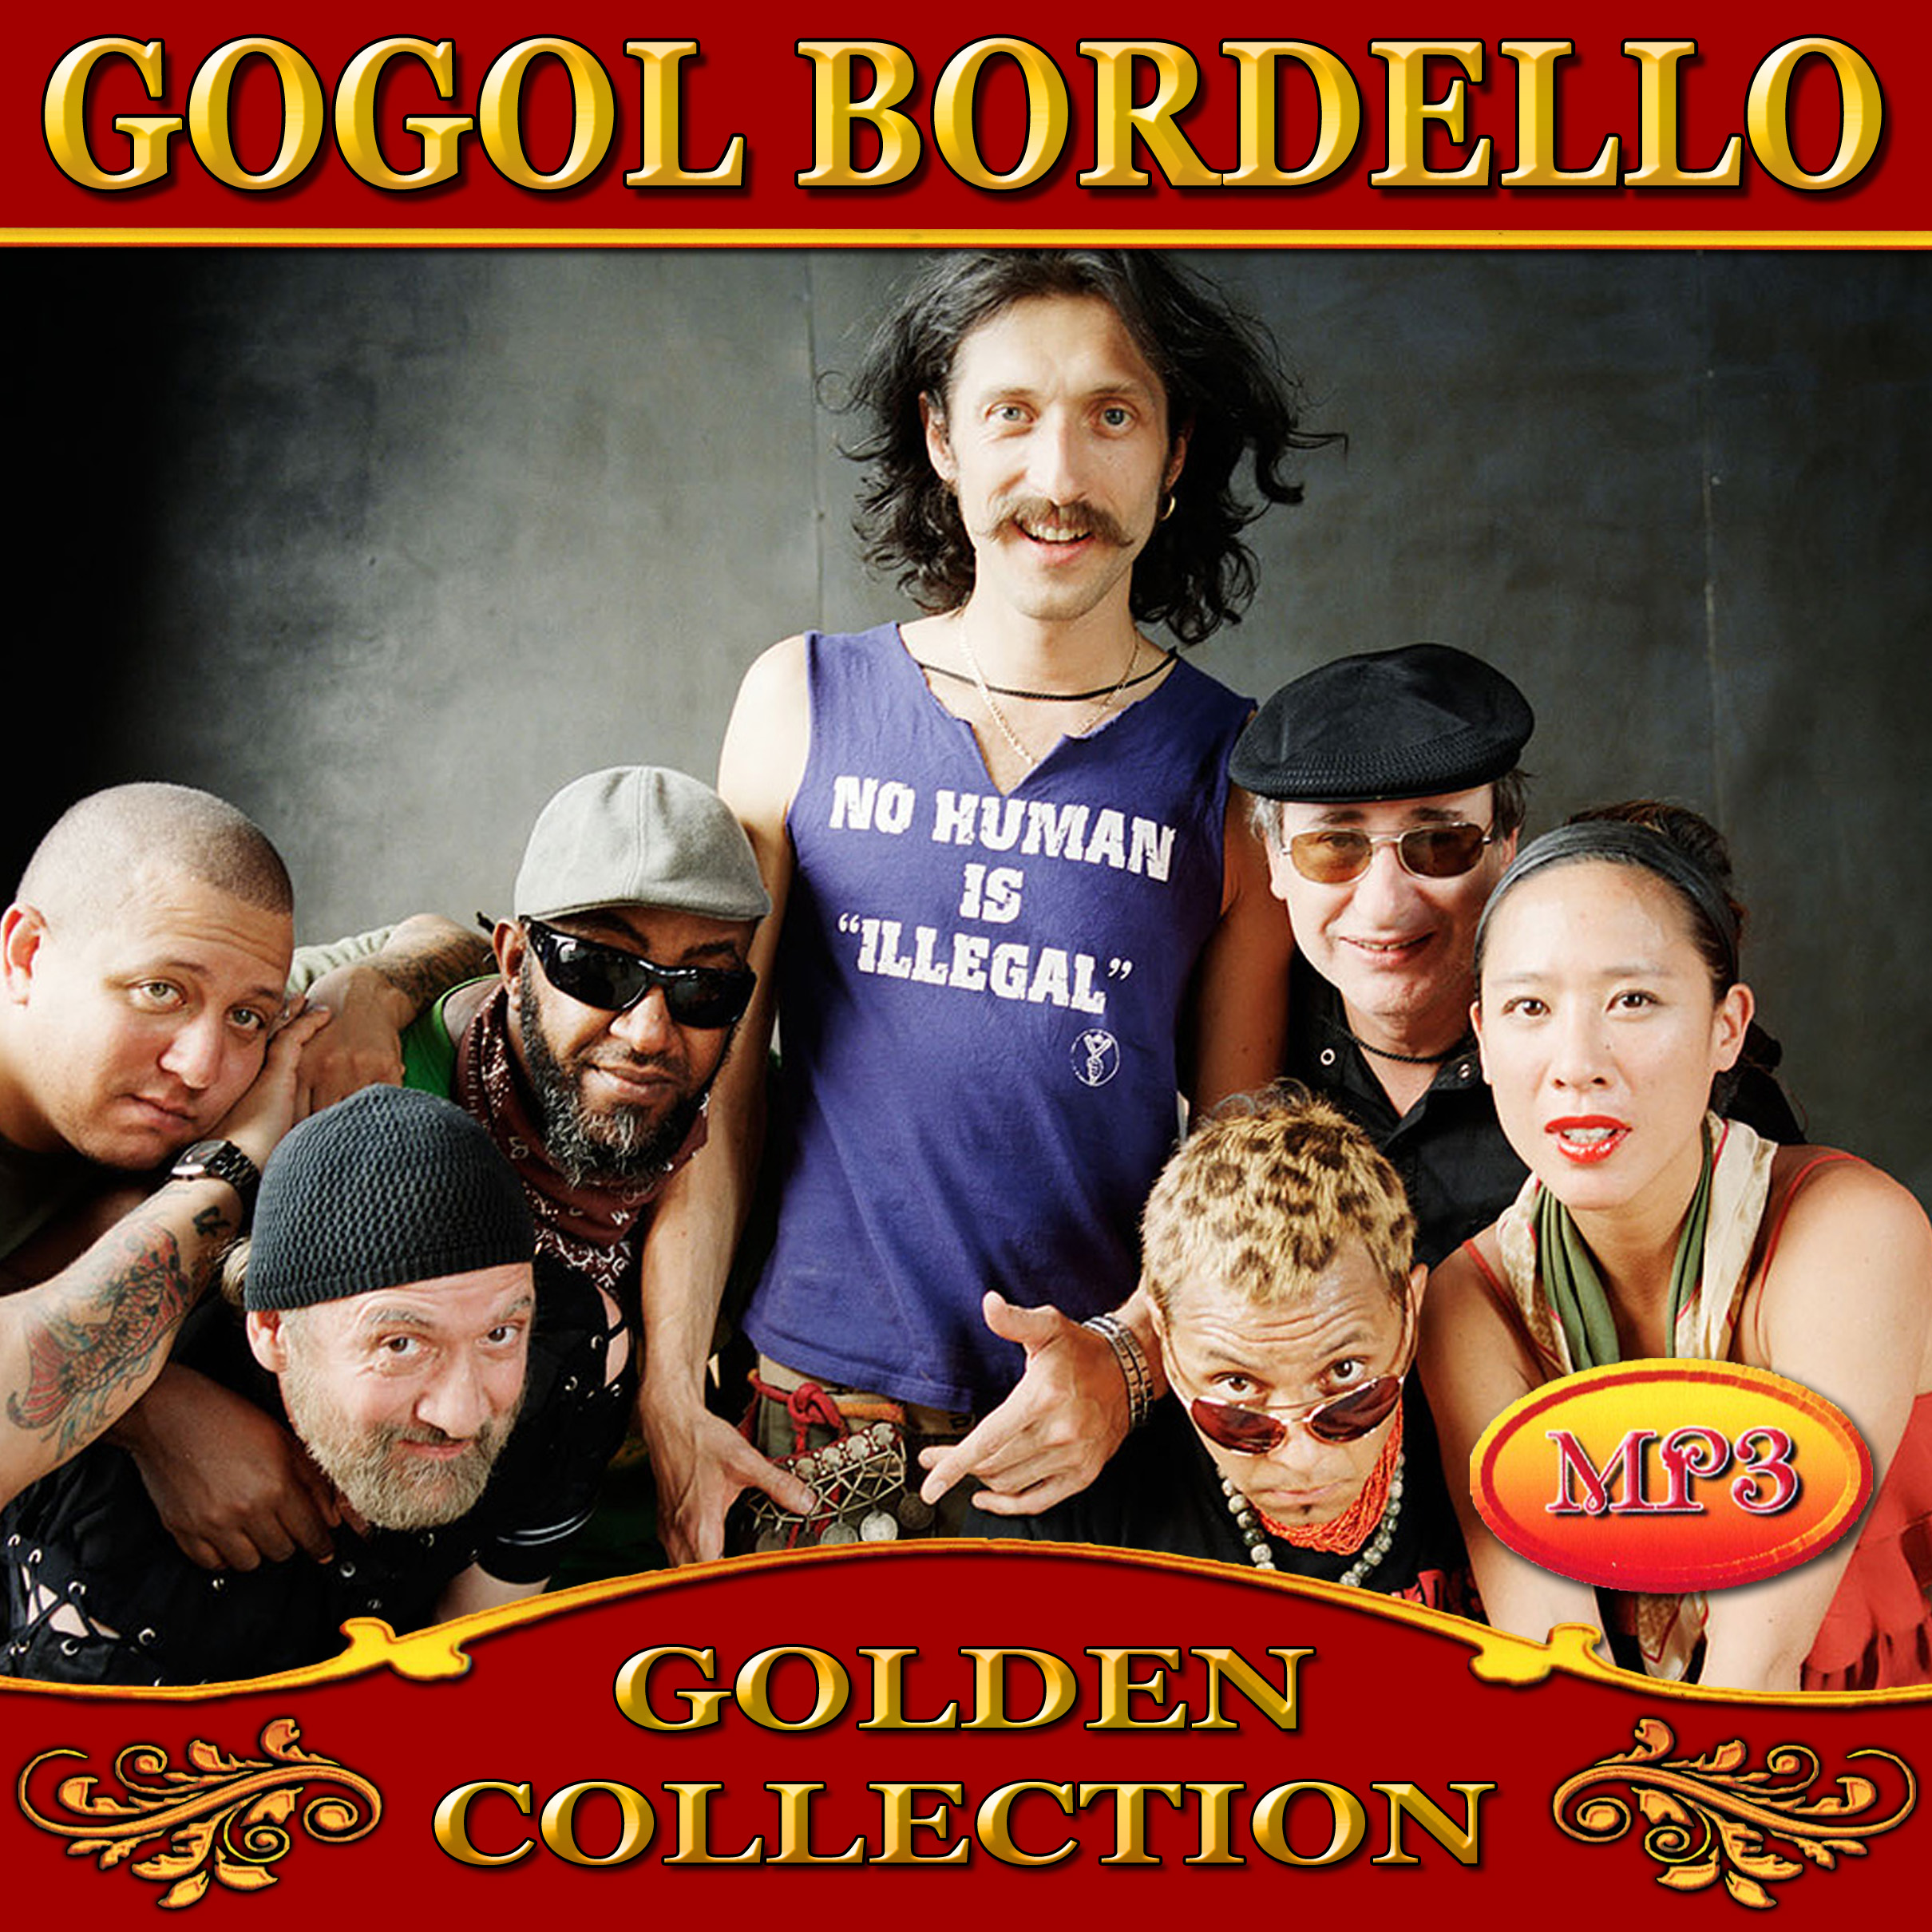 Gogol Bordello [mp3]